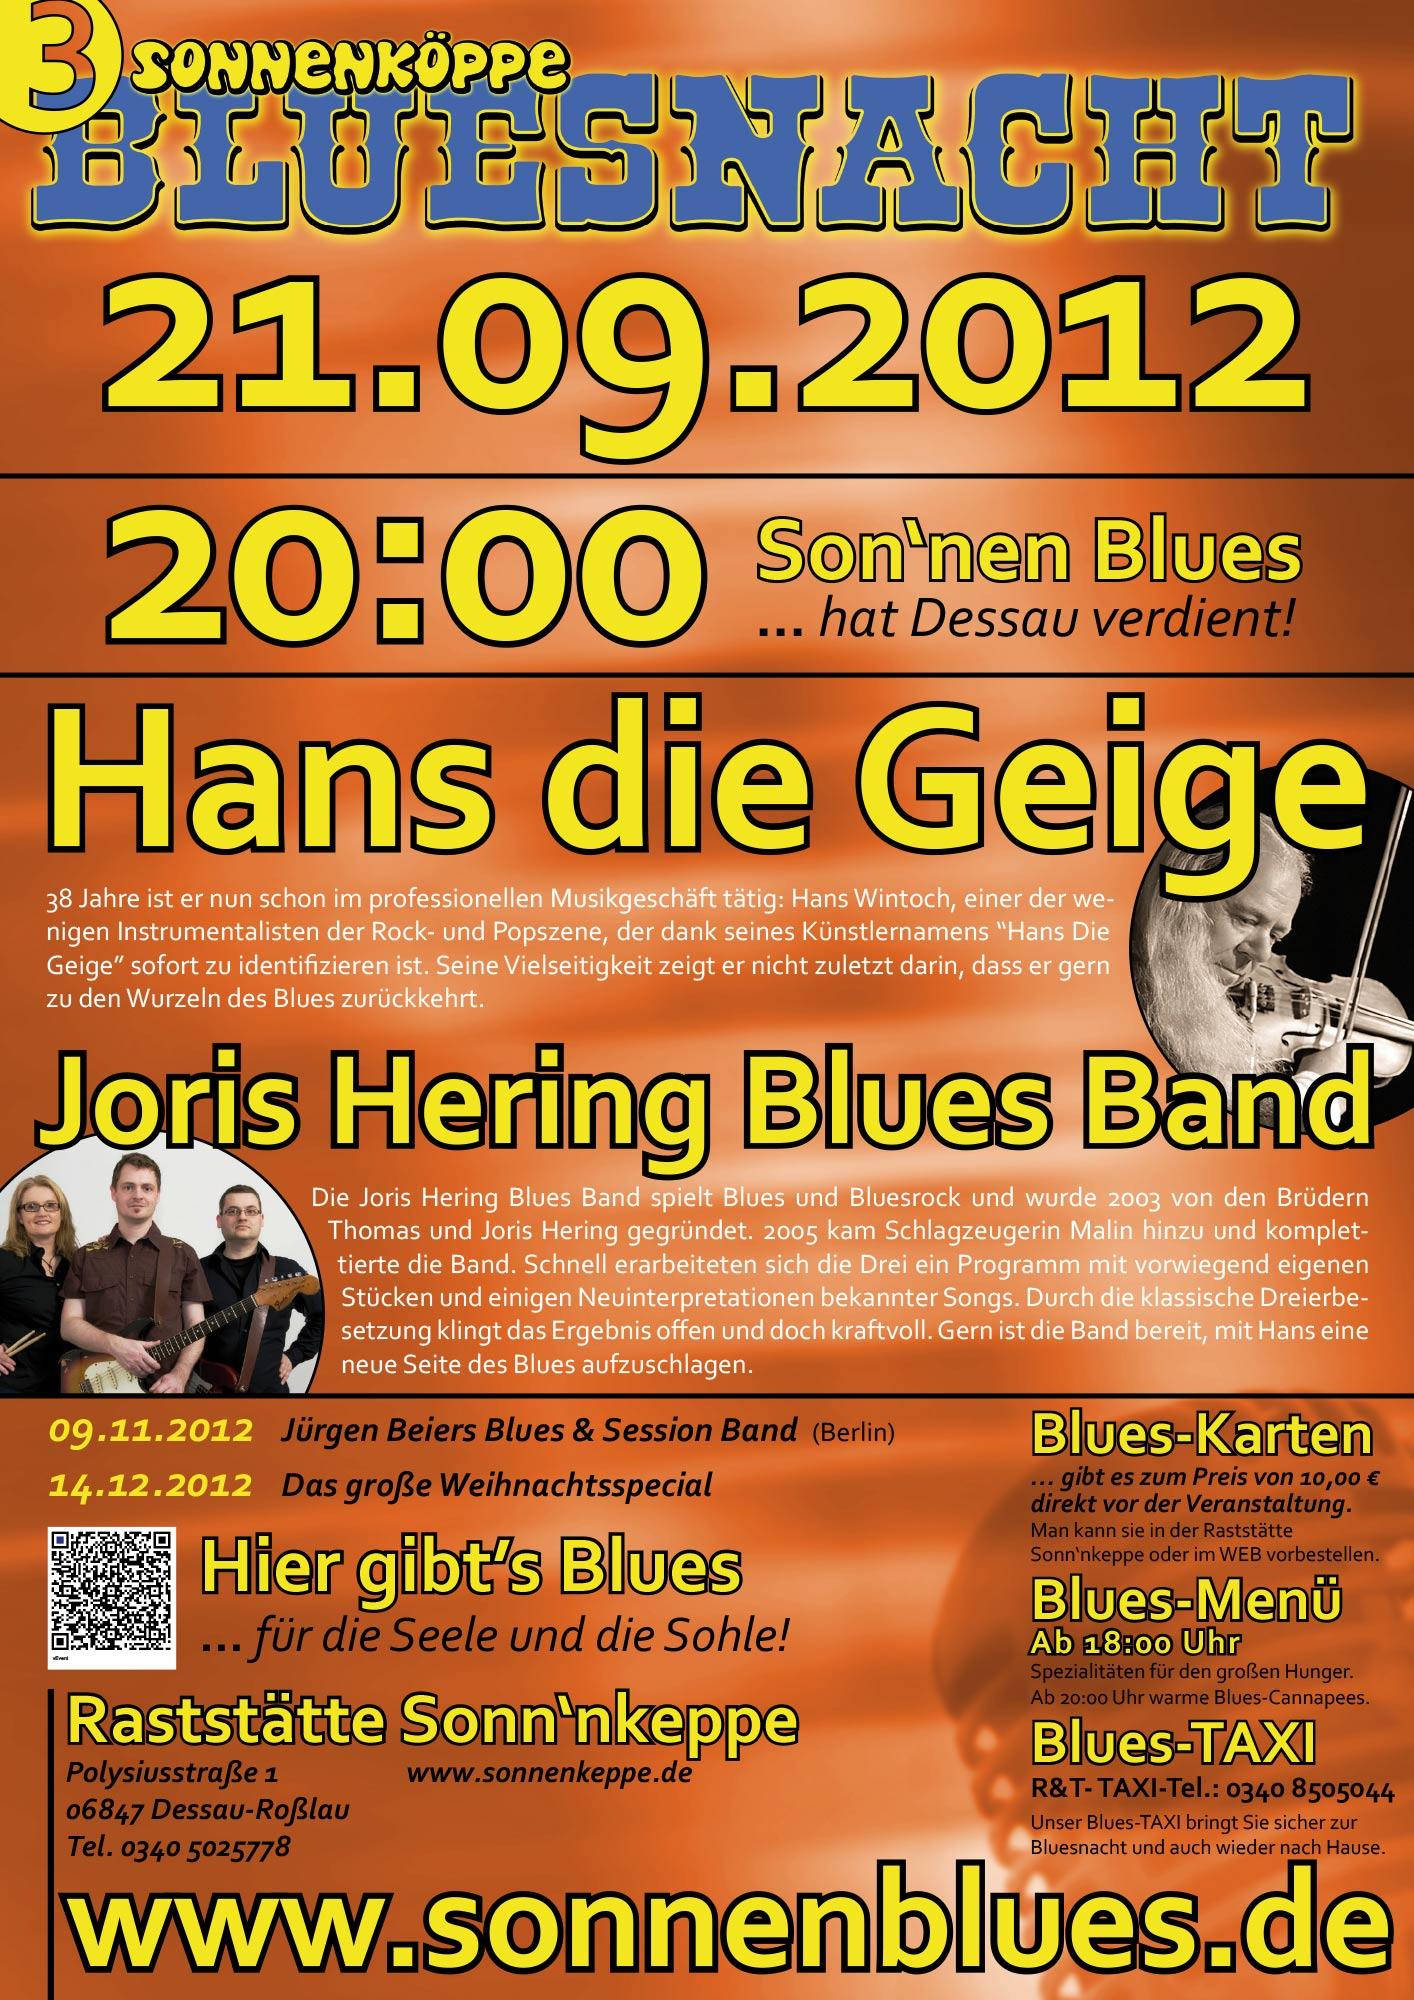 Bluesnacht #4 - Hans die Geige & Joris Hering Blues Band